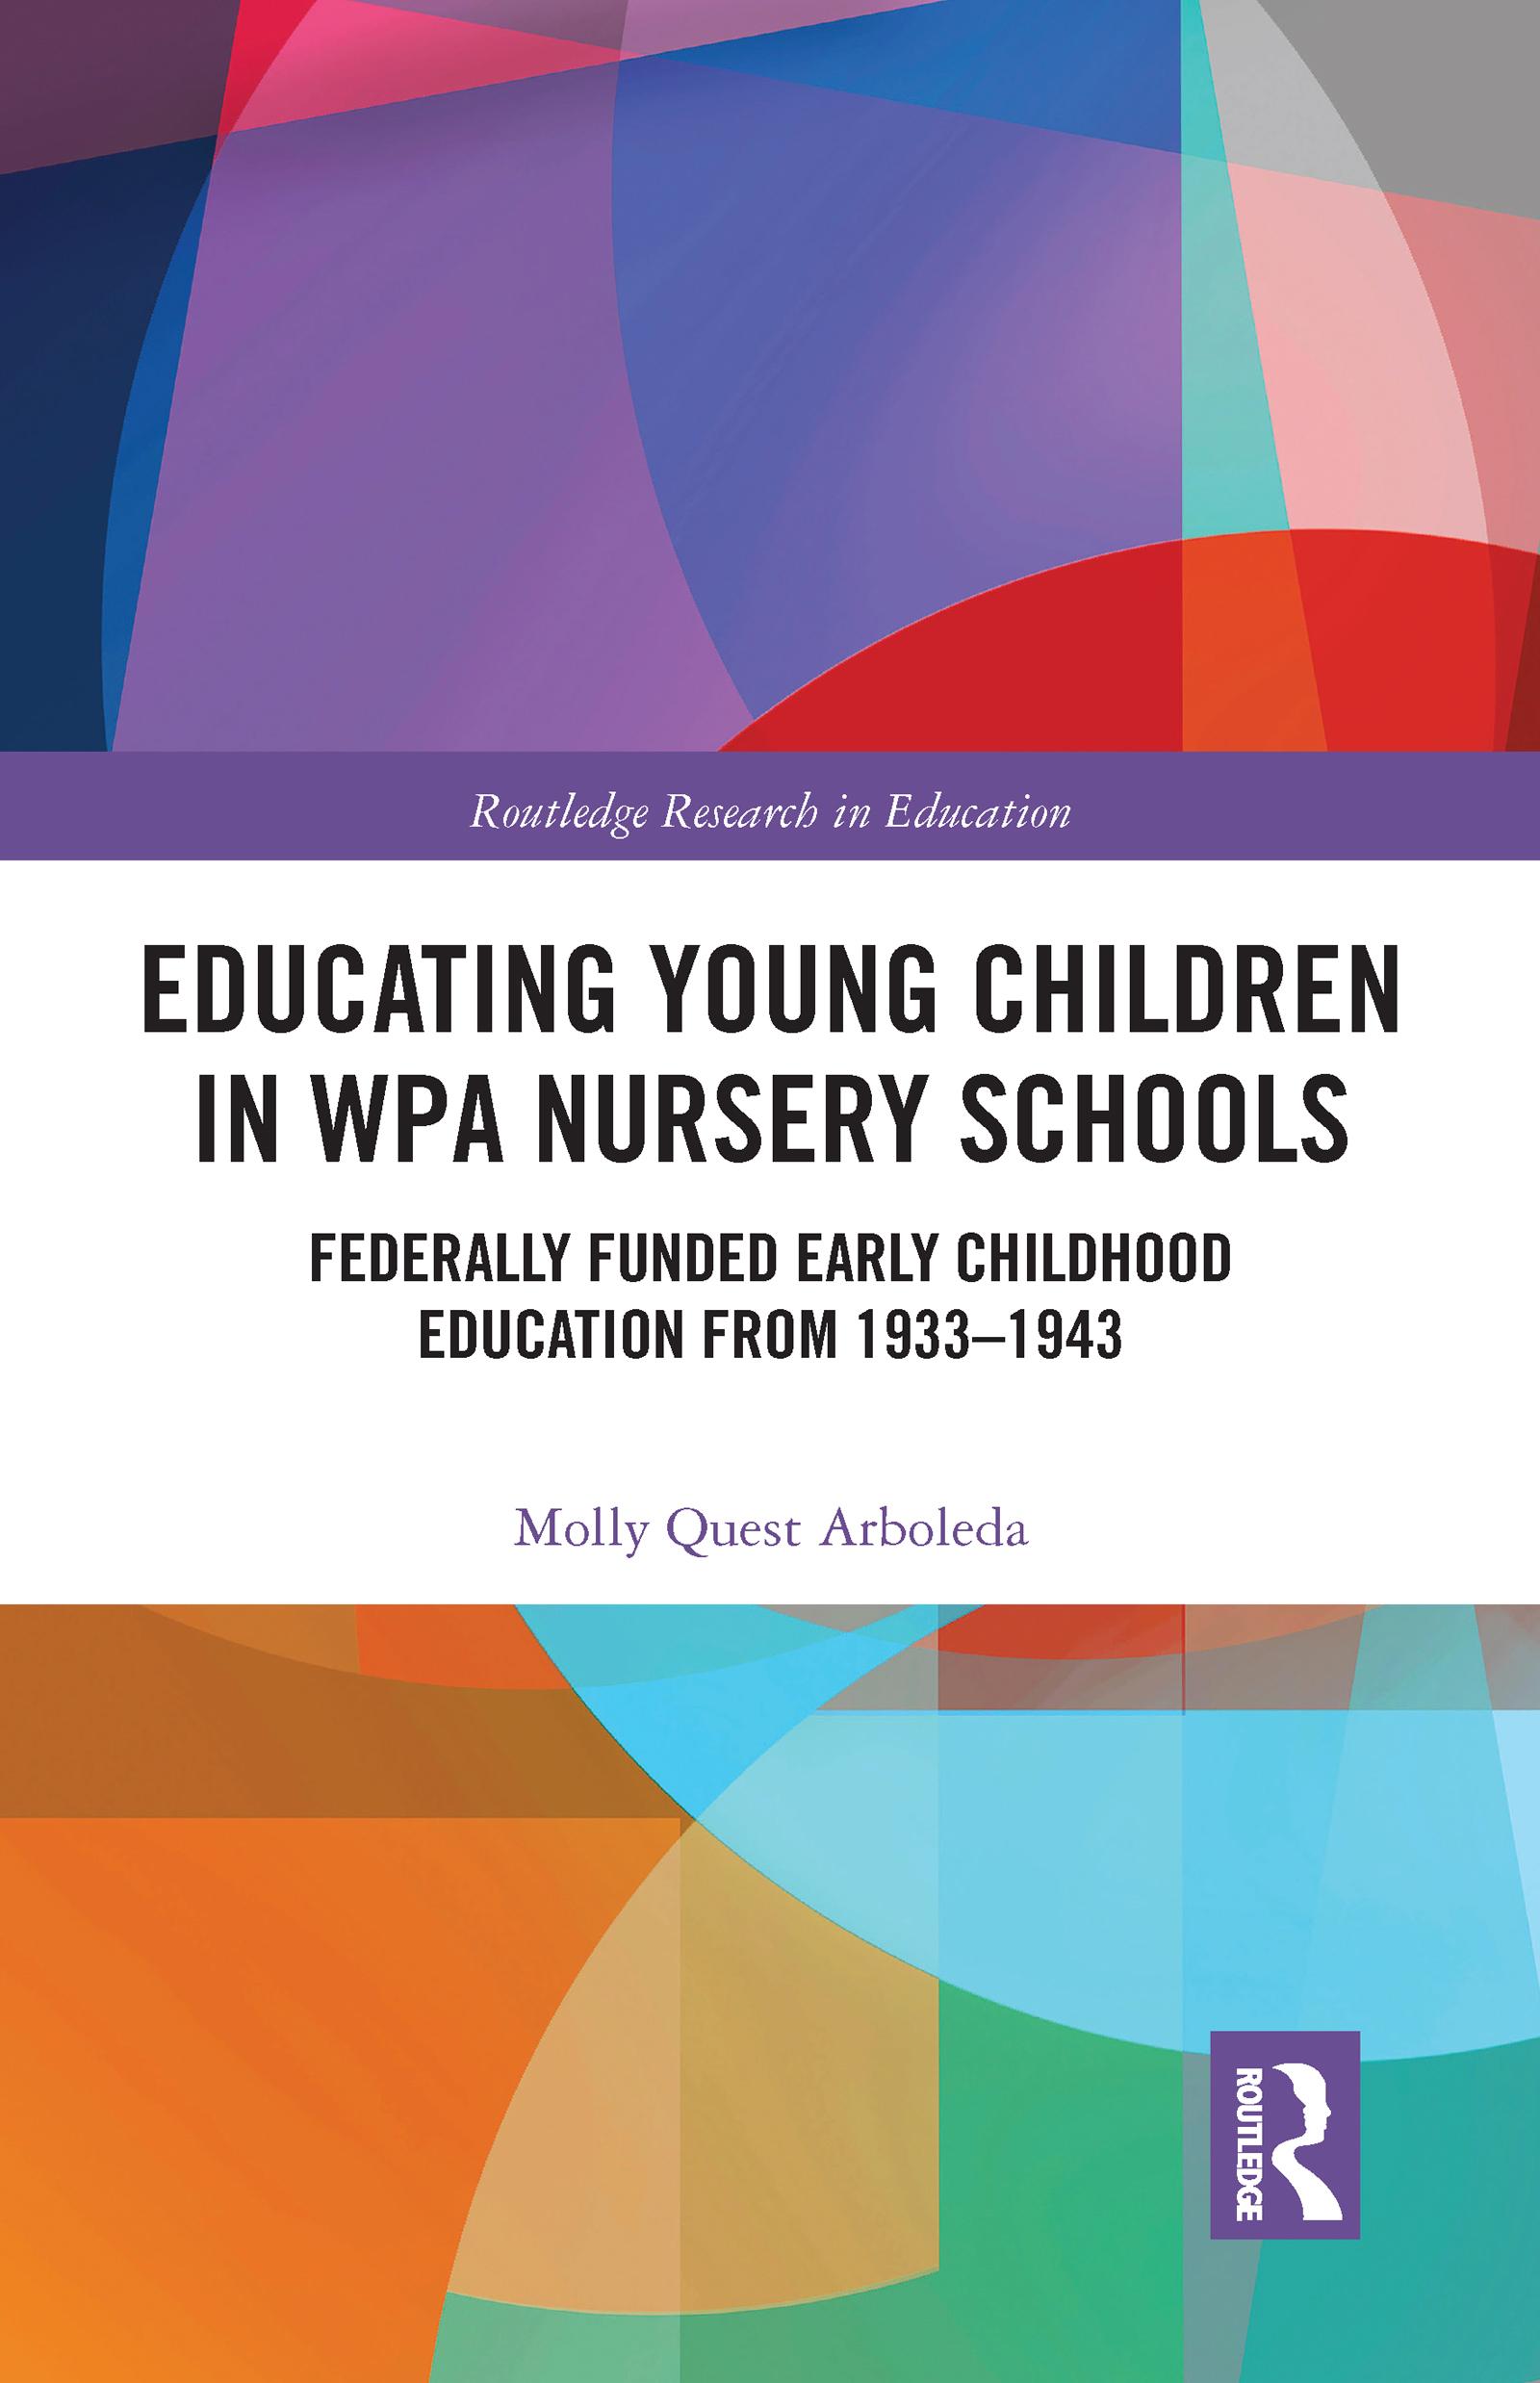 Educating Young Children in WPA Nursery Schools